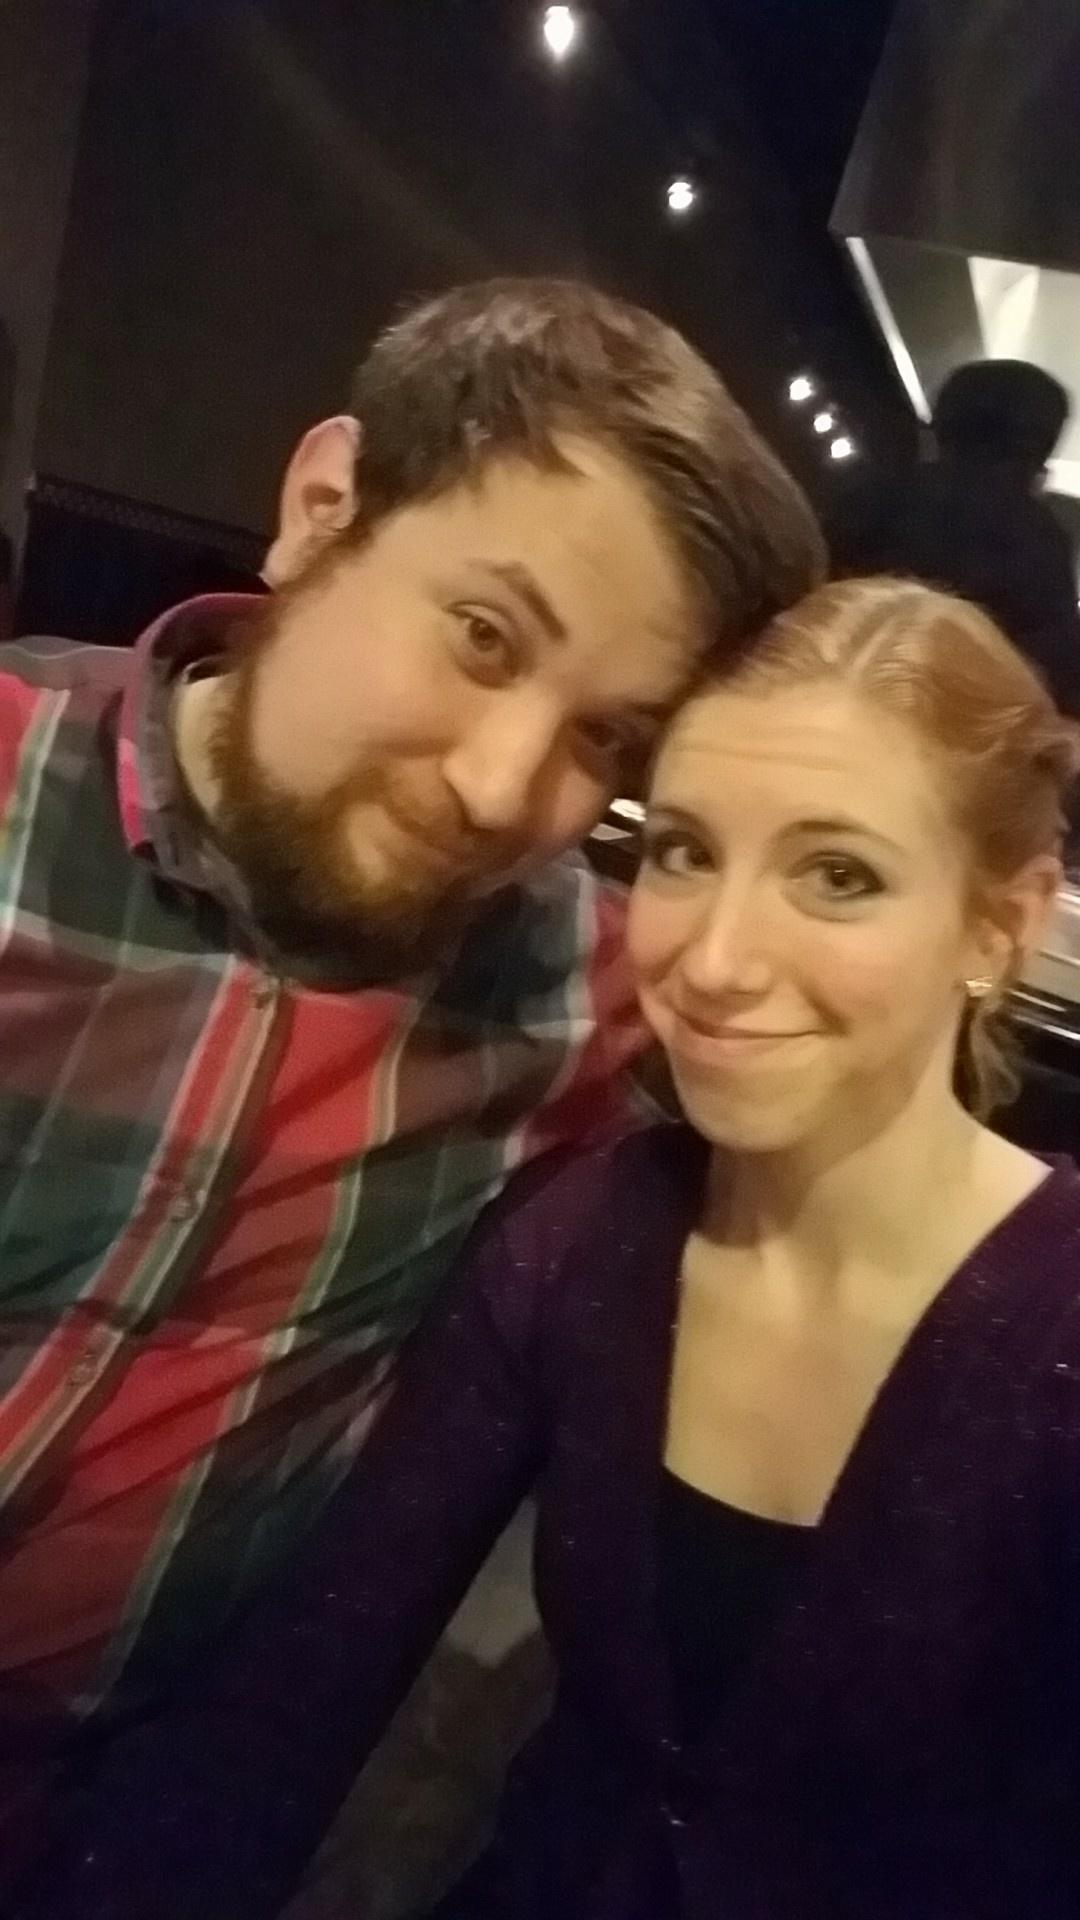 Awkward Selfie at Hibachi Dinner